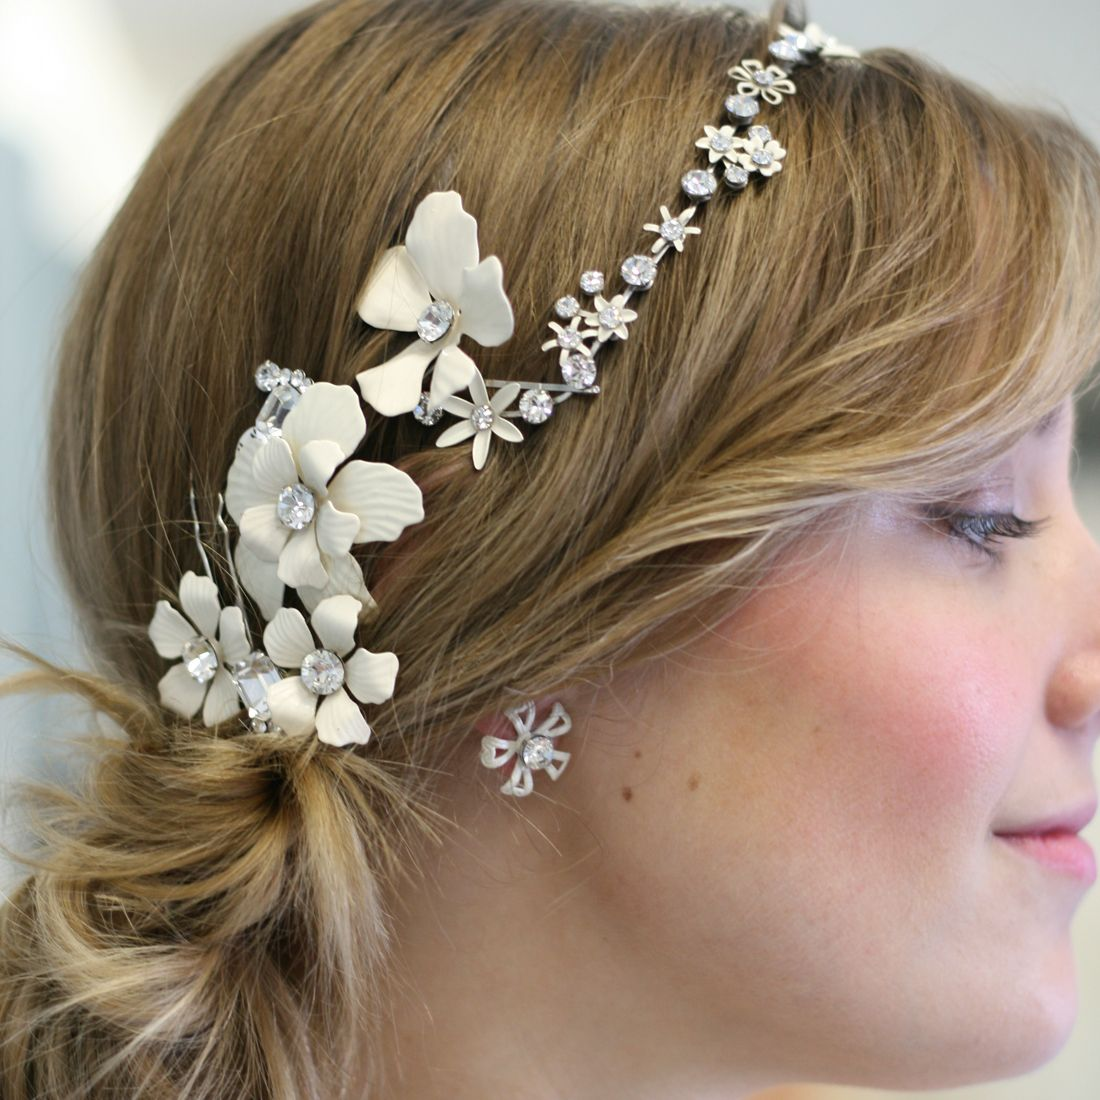 paris wedding hair accessories alta moda bridal | my wedding